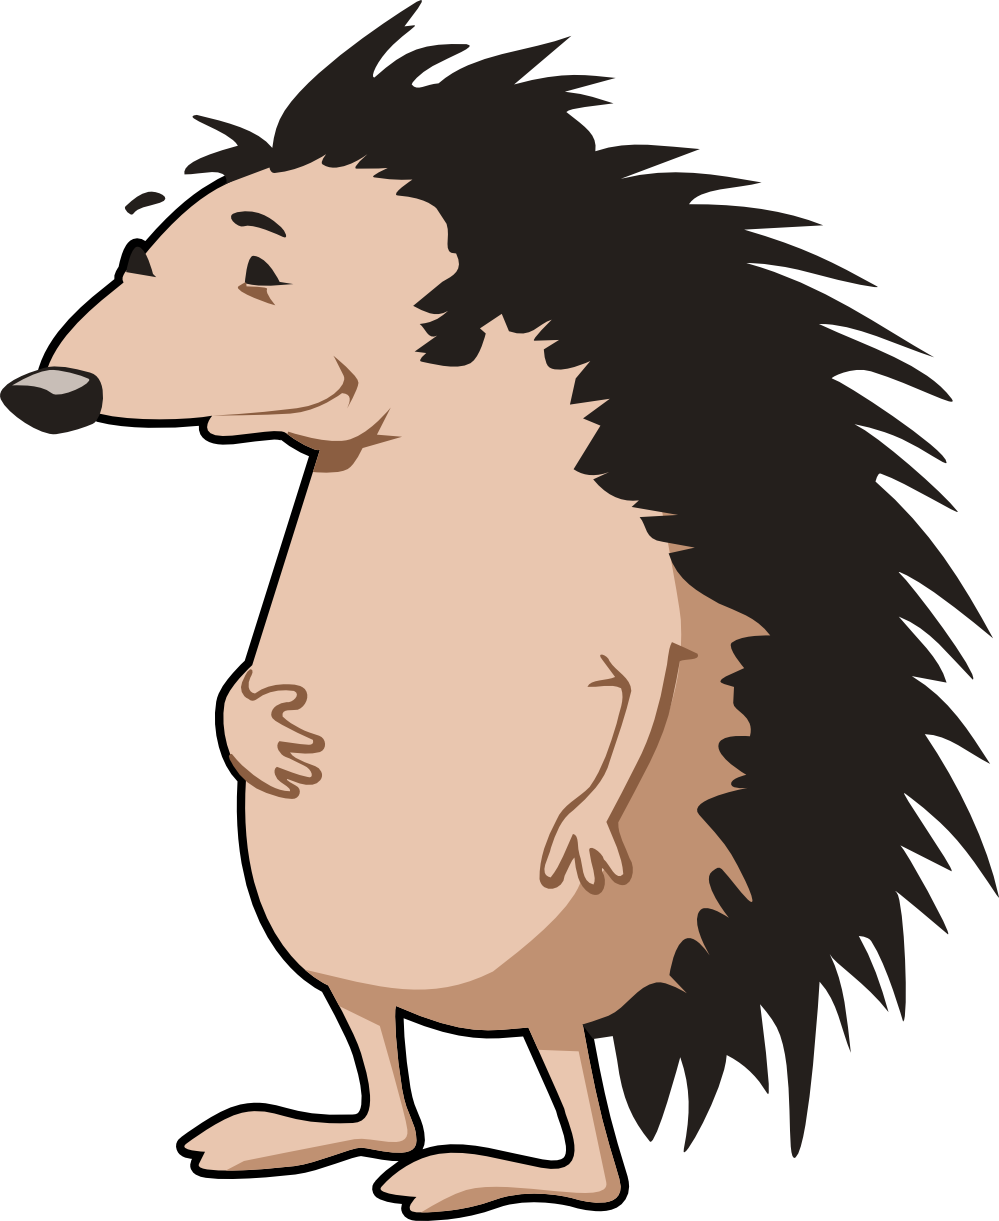 Woodland clipart porcupine. Grandma and baby super